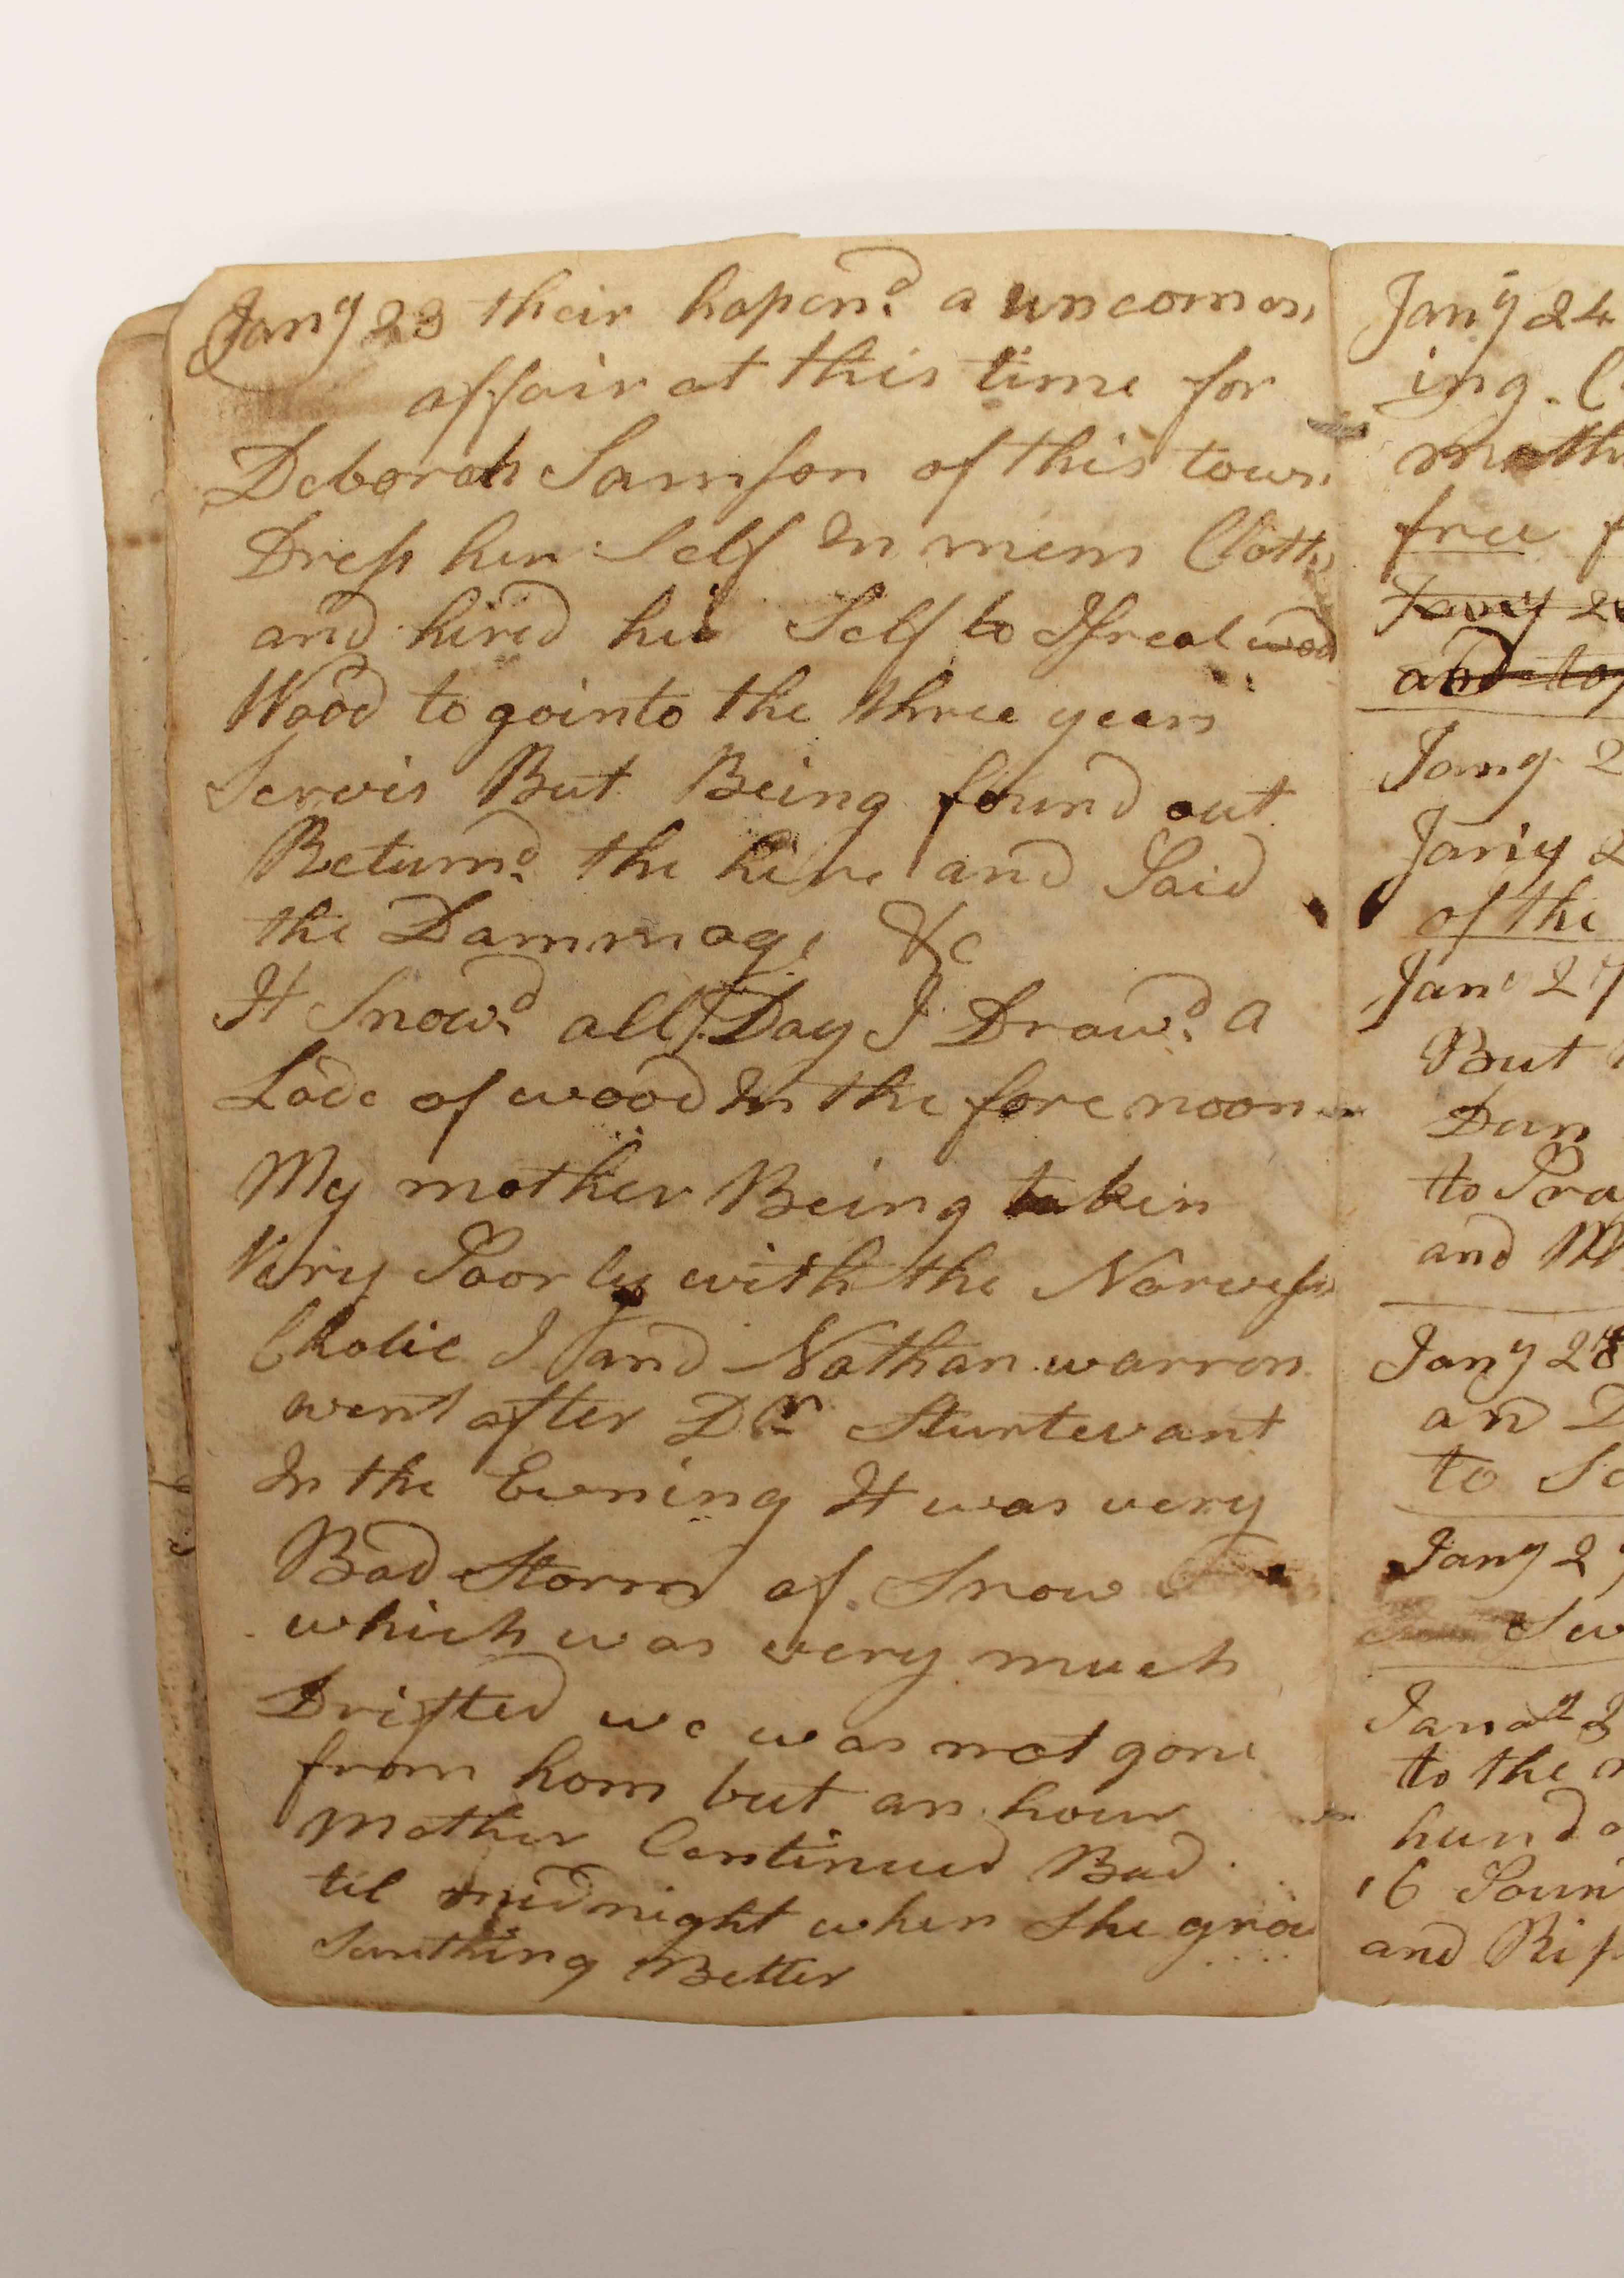 Photo of an Abner Weston diary mentioning Deborah Sampson.